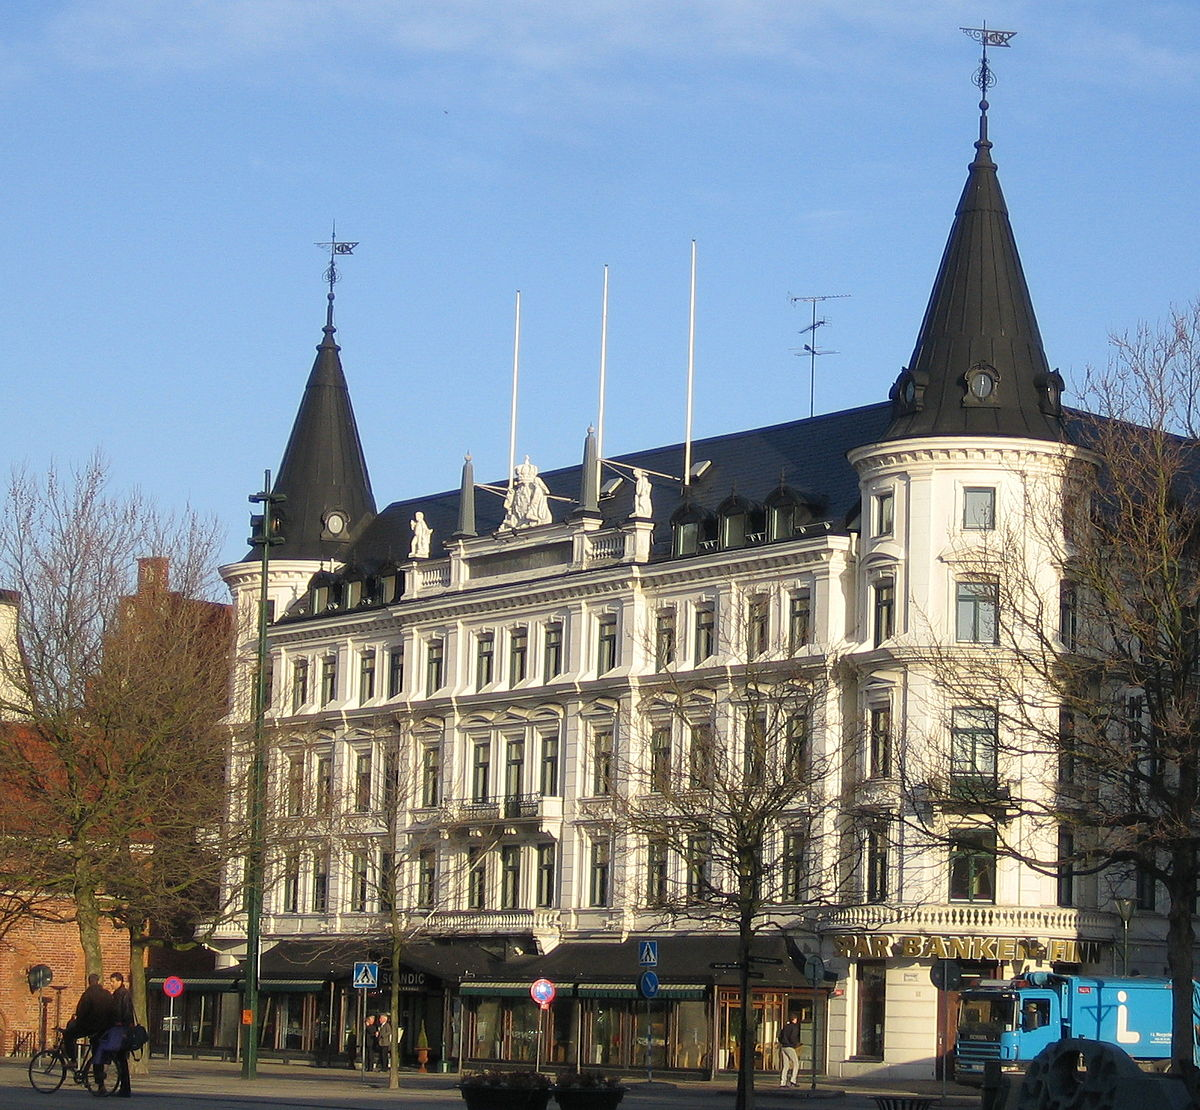 Hotell Kramer vid Stortorget